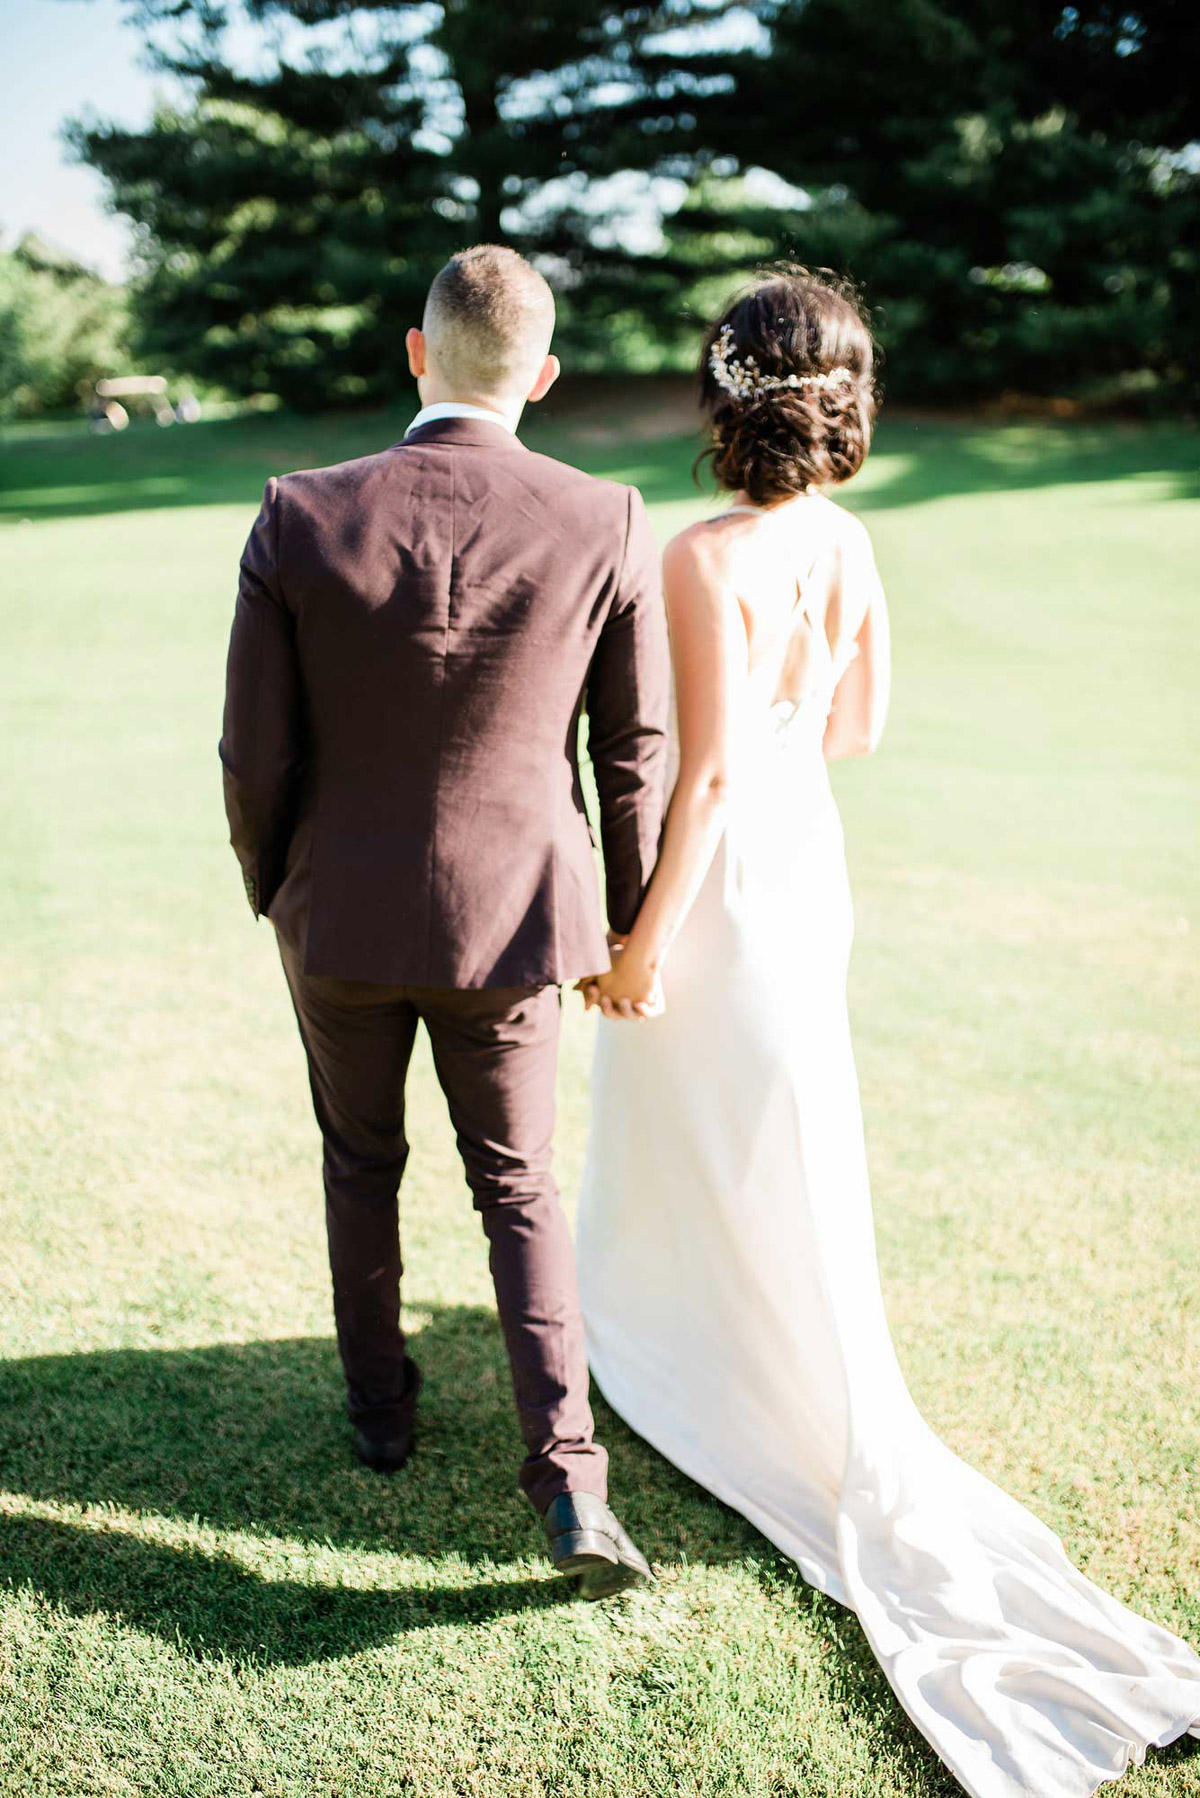 destiny-dawn-photography-vineyard-bride-swish-list-knollwood-golf-and-country-club-ancaster-wedding-editorial-18.jpg